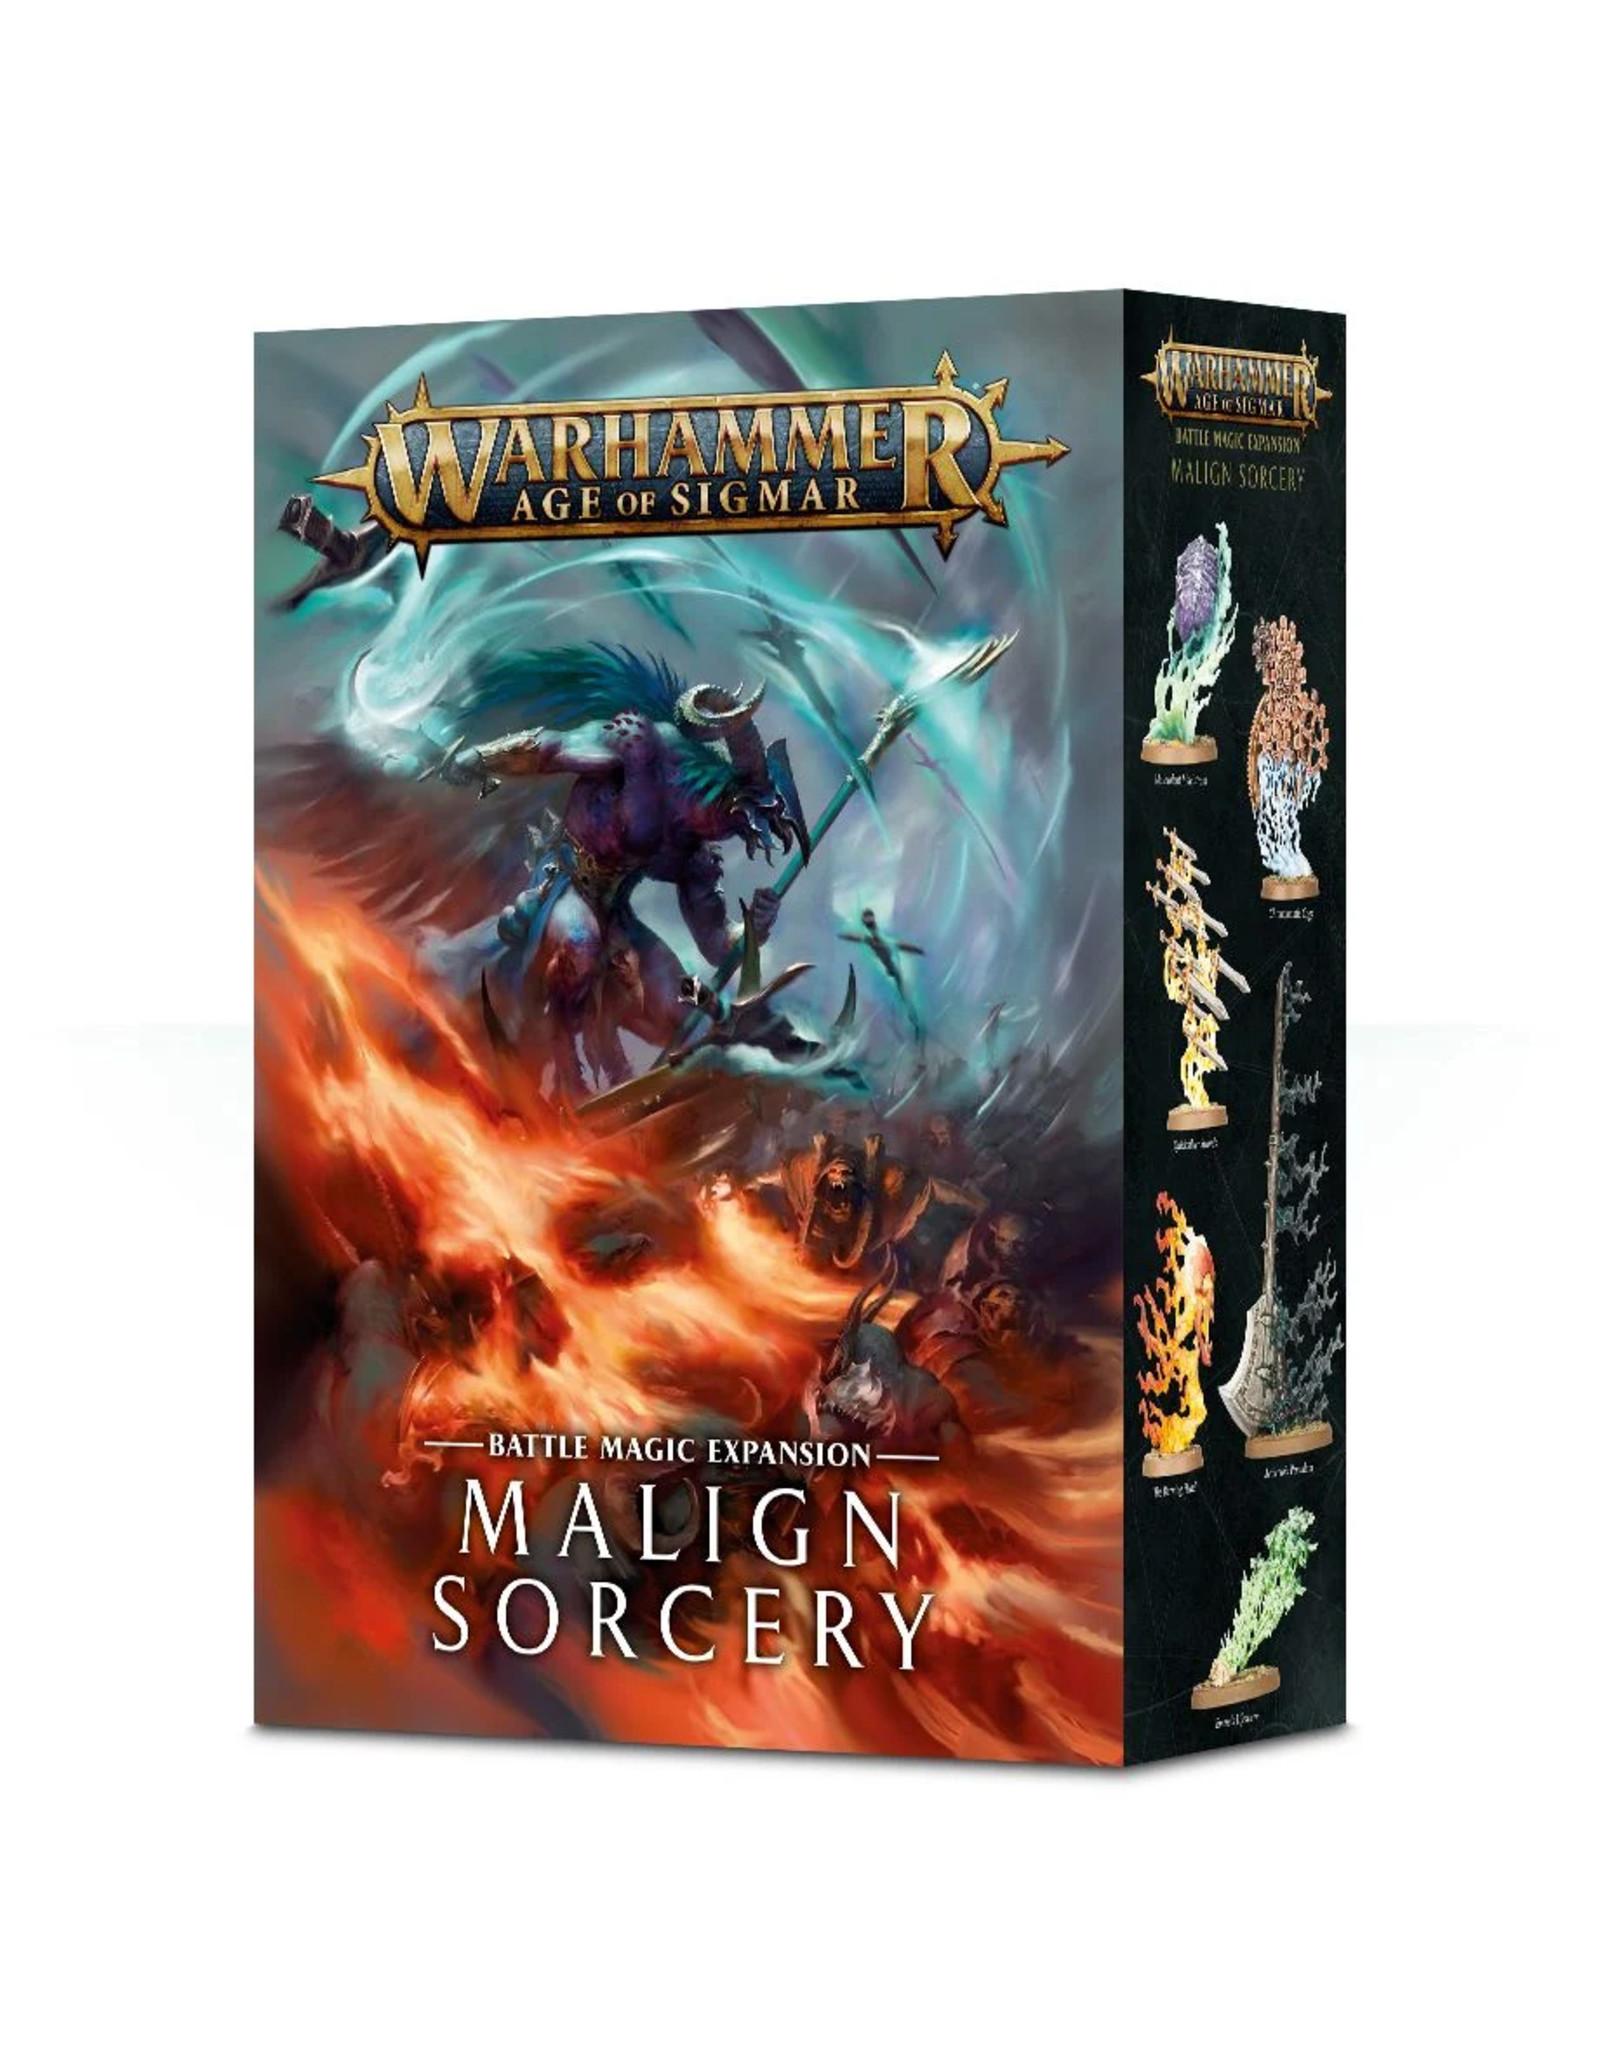 Age of Sigmar Age of Sigmar: Malign Sorcery